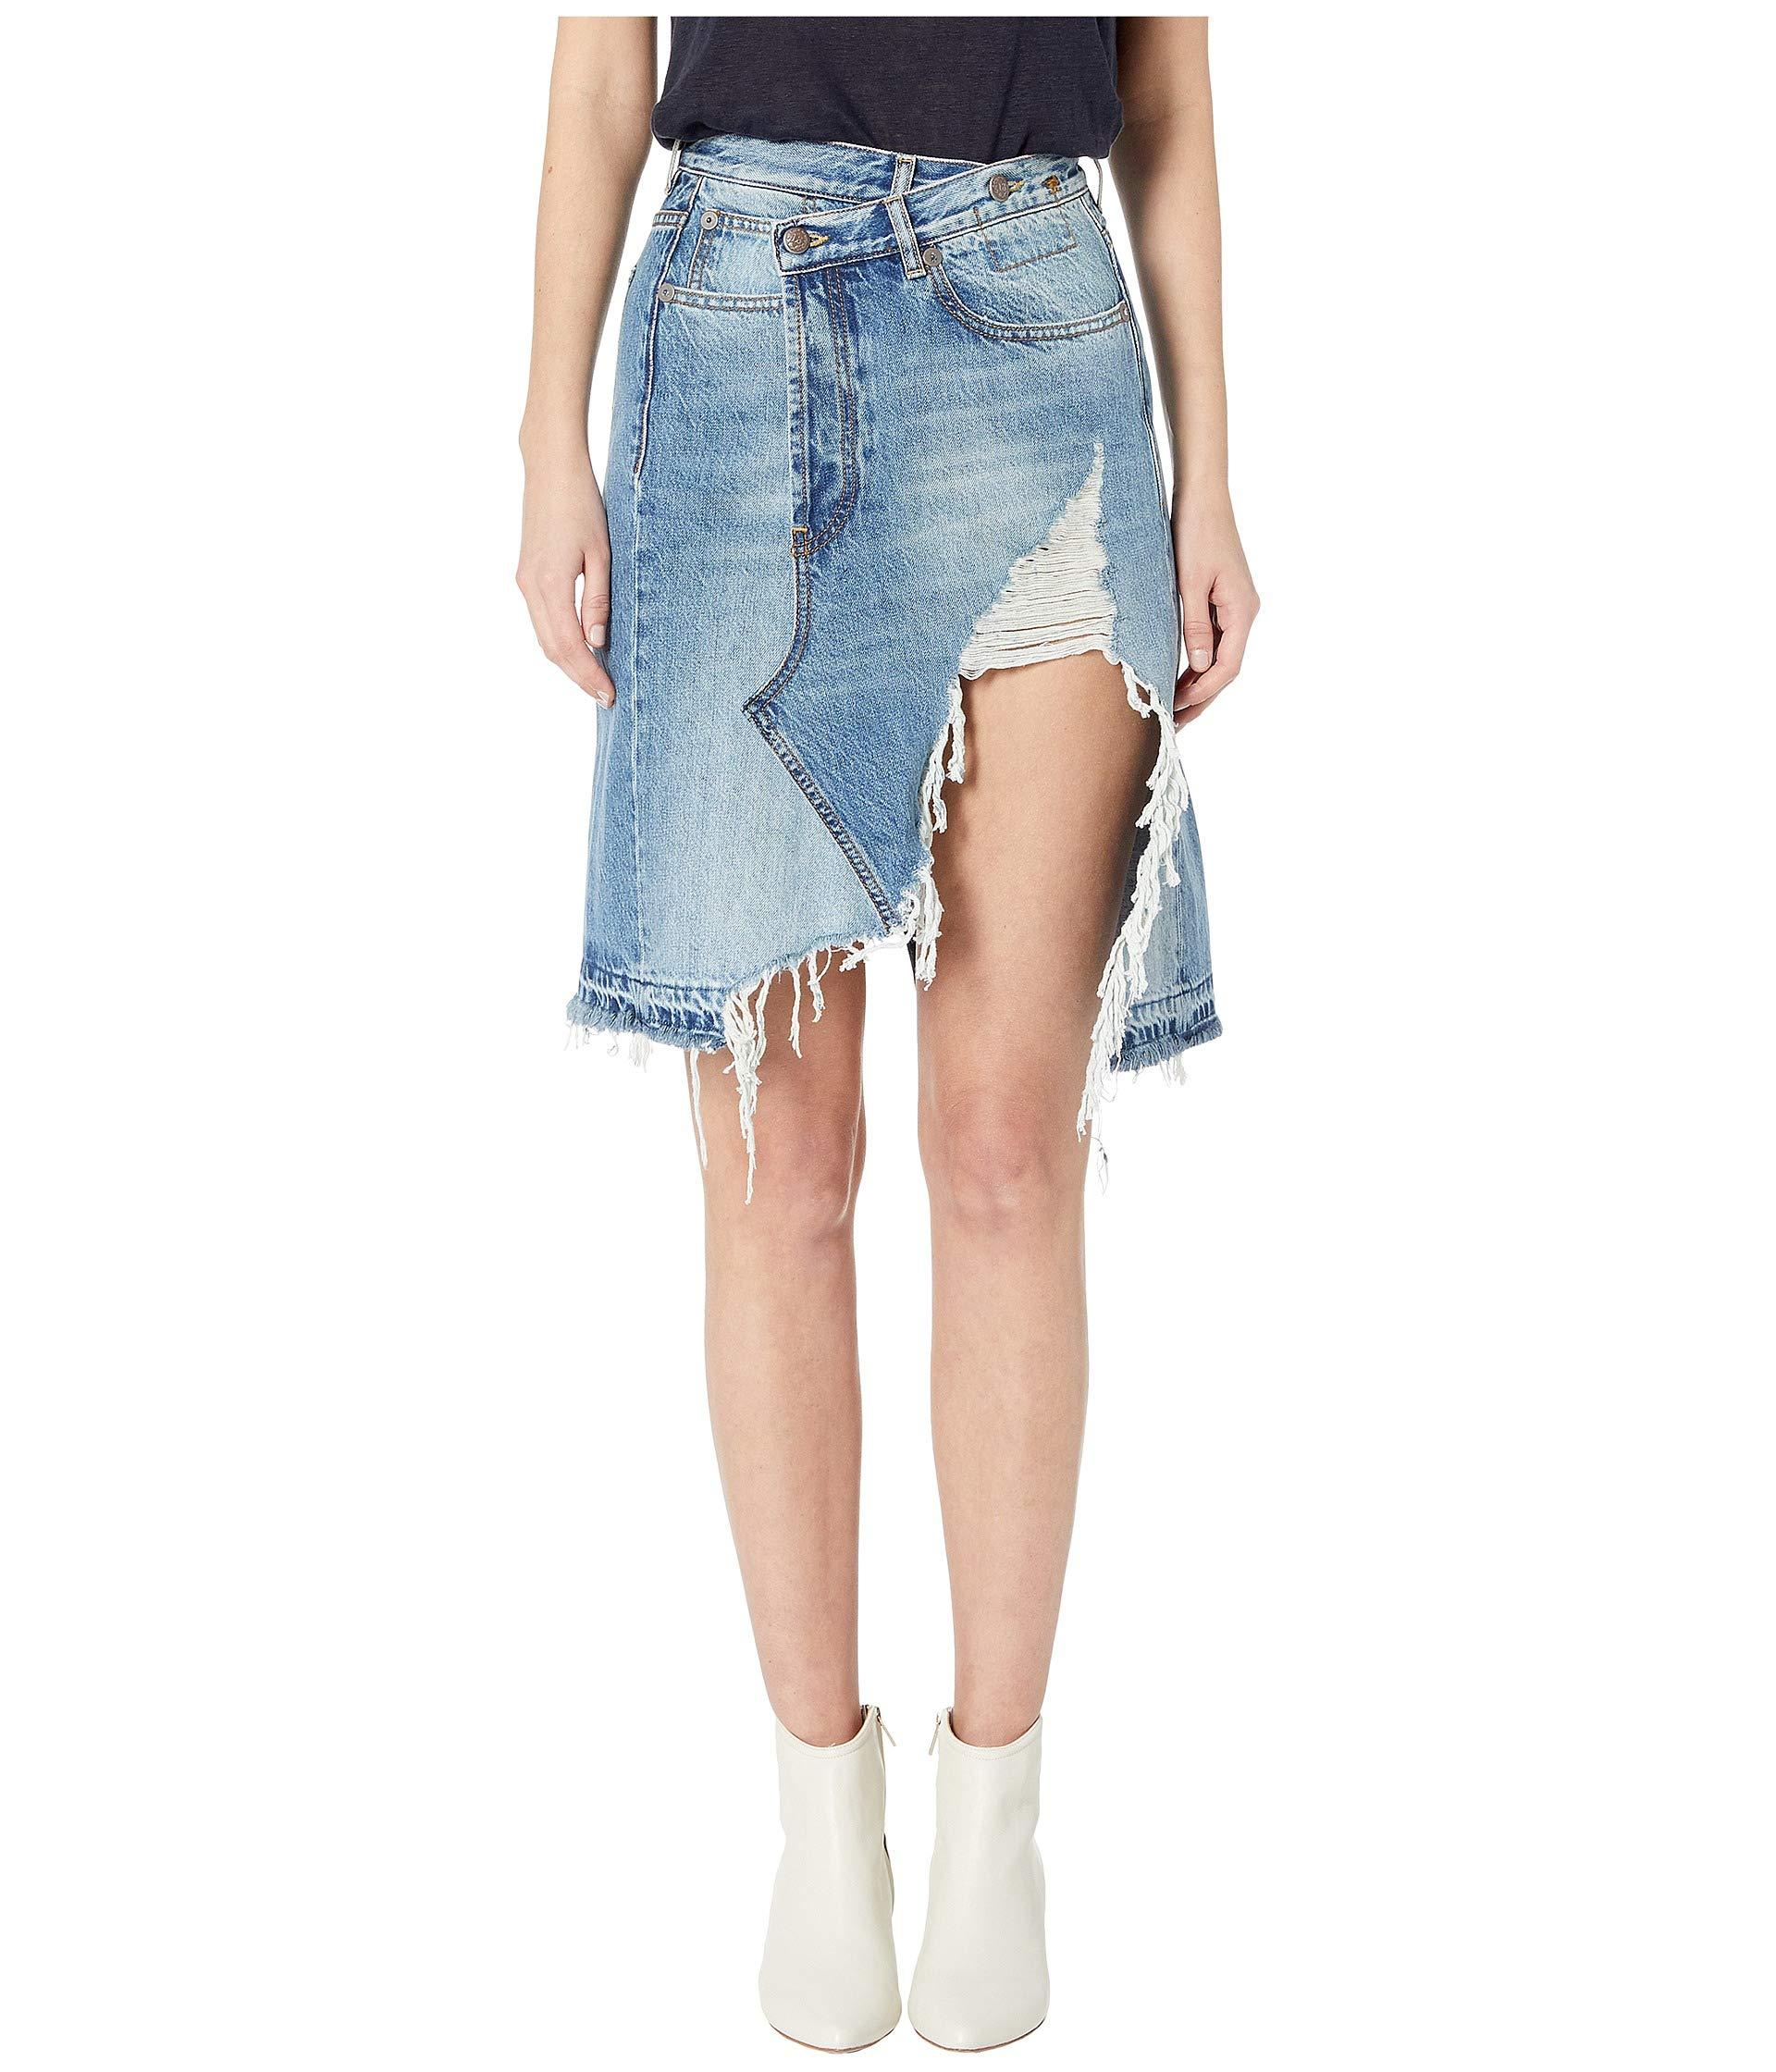 448beb33e R13 Norbury Denim Skirt at Luxury.Zappos.com